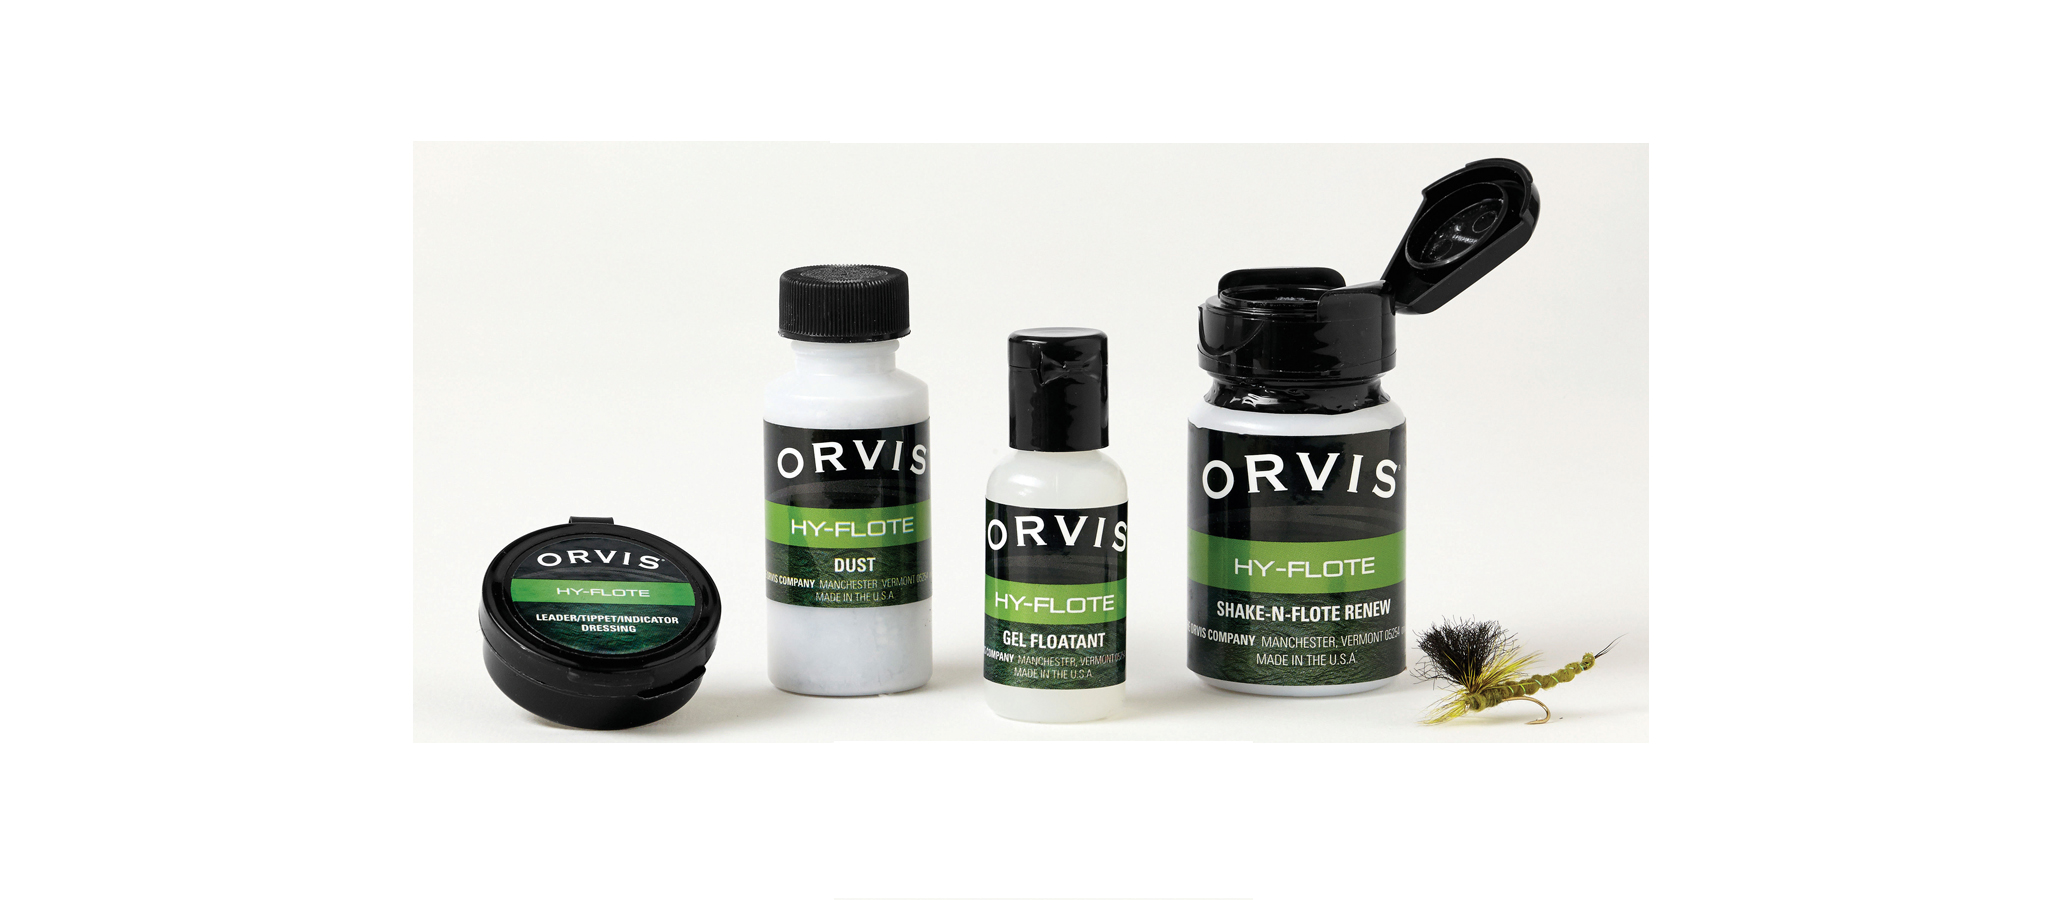 Orvis-Hy-Flote-Floatants